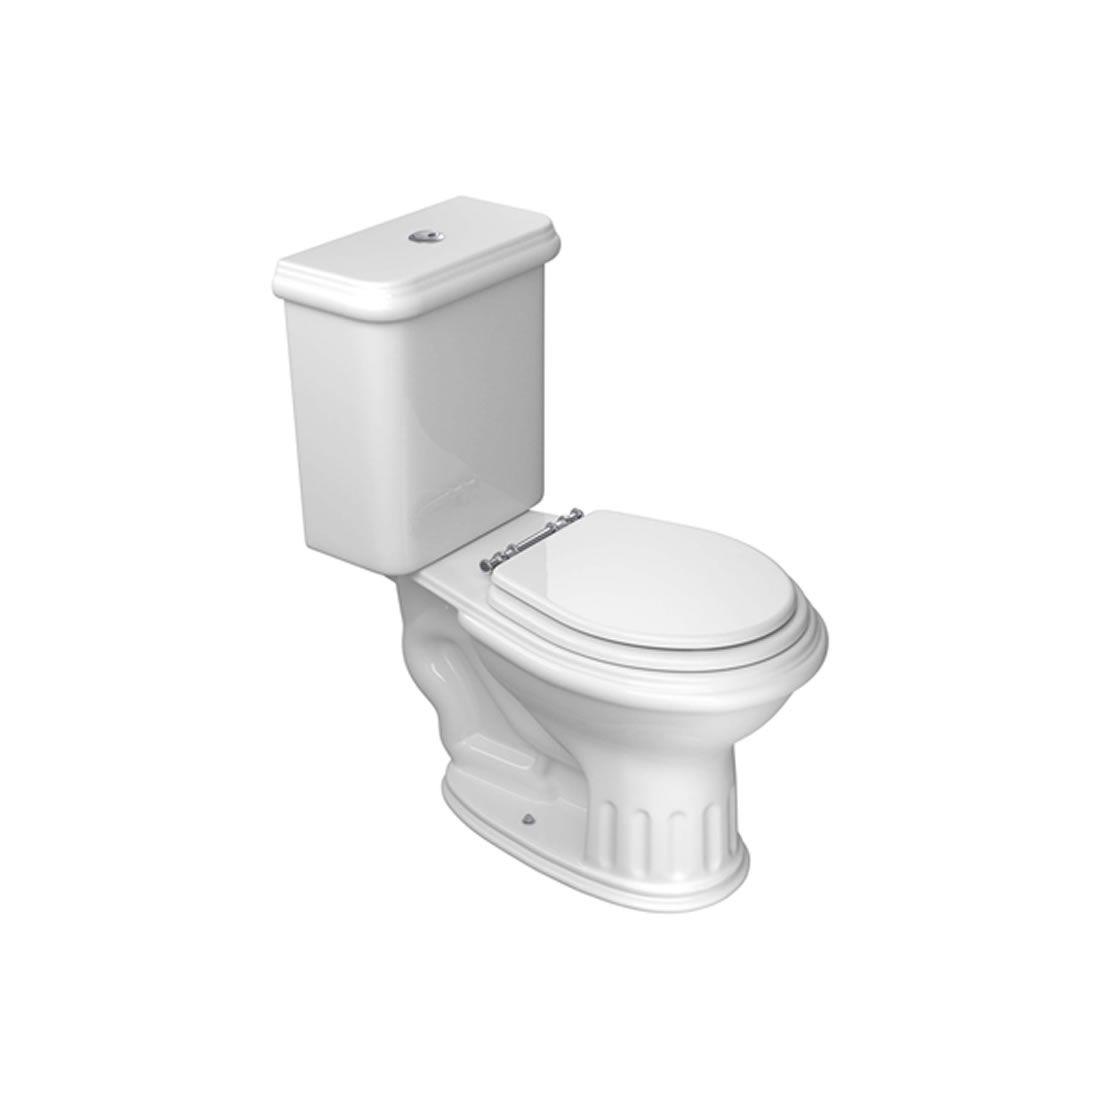 Kit Vaso Sanitário com Caixa Acoplada 3/6L Ecoflush Windsor Branco Deca